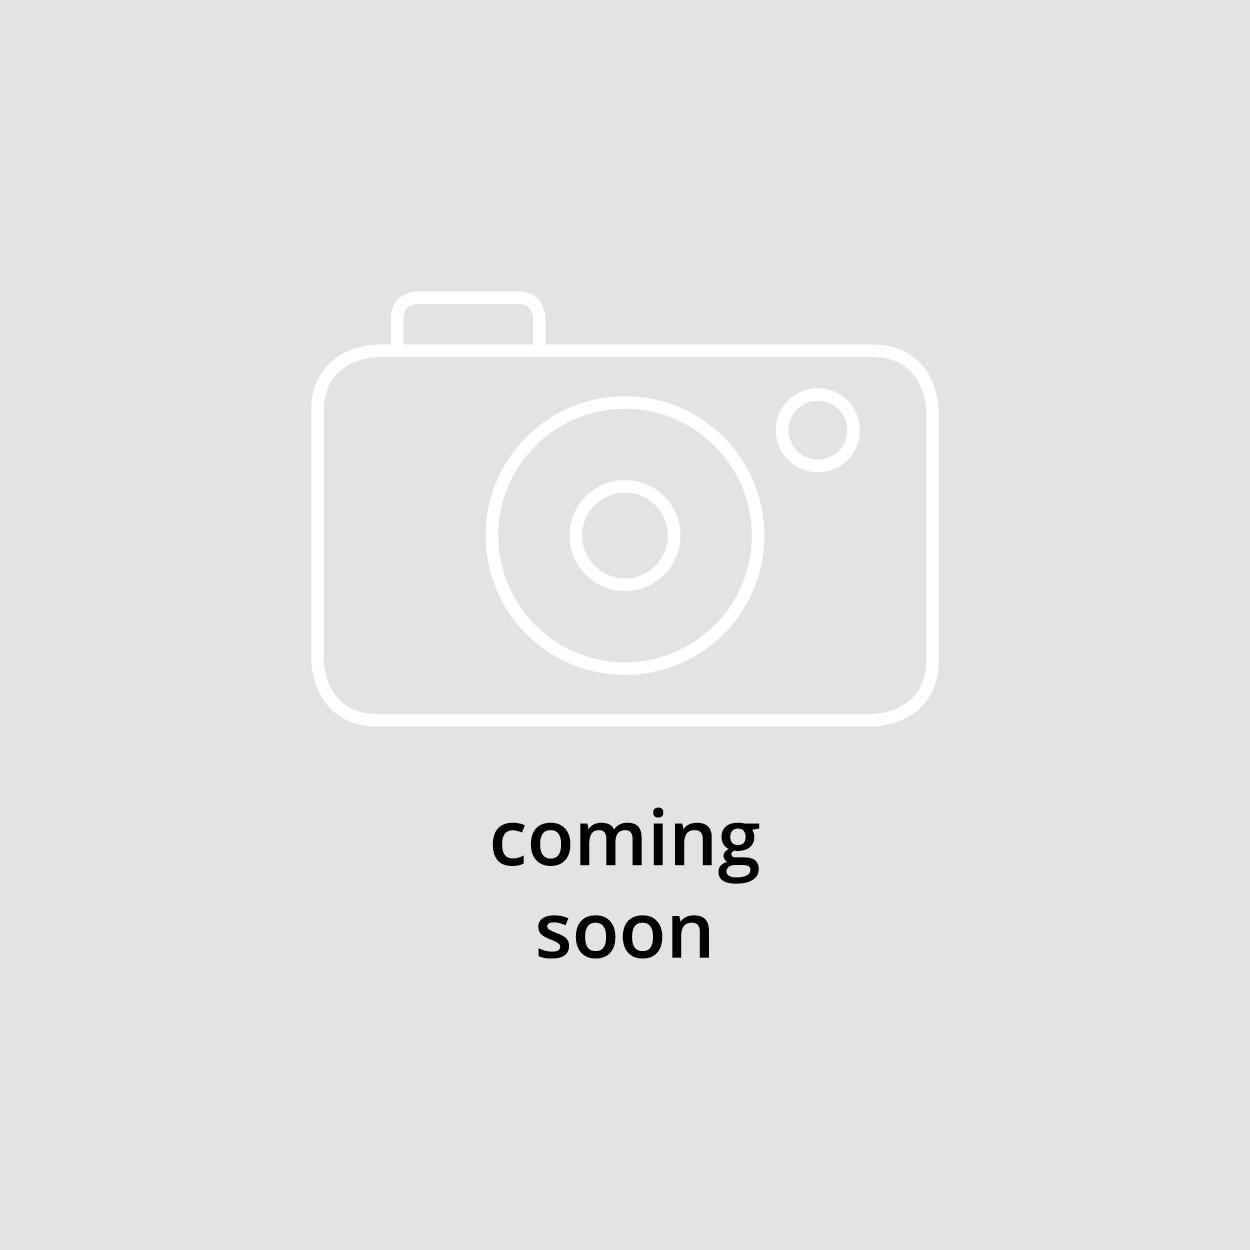 880200 Torretta Standard per Gildemeister IMIS08, AS16, AS20, GS20, GM20, GM20AC